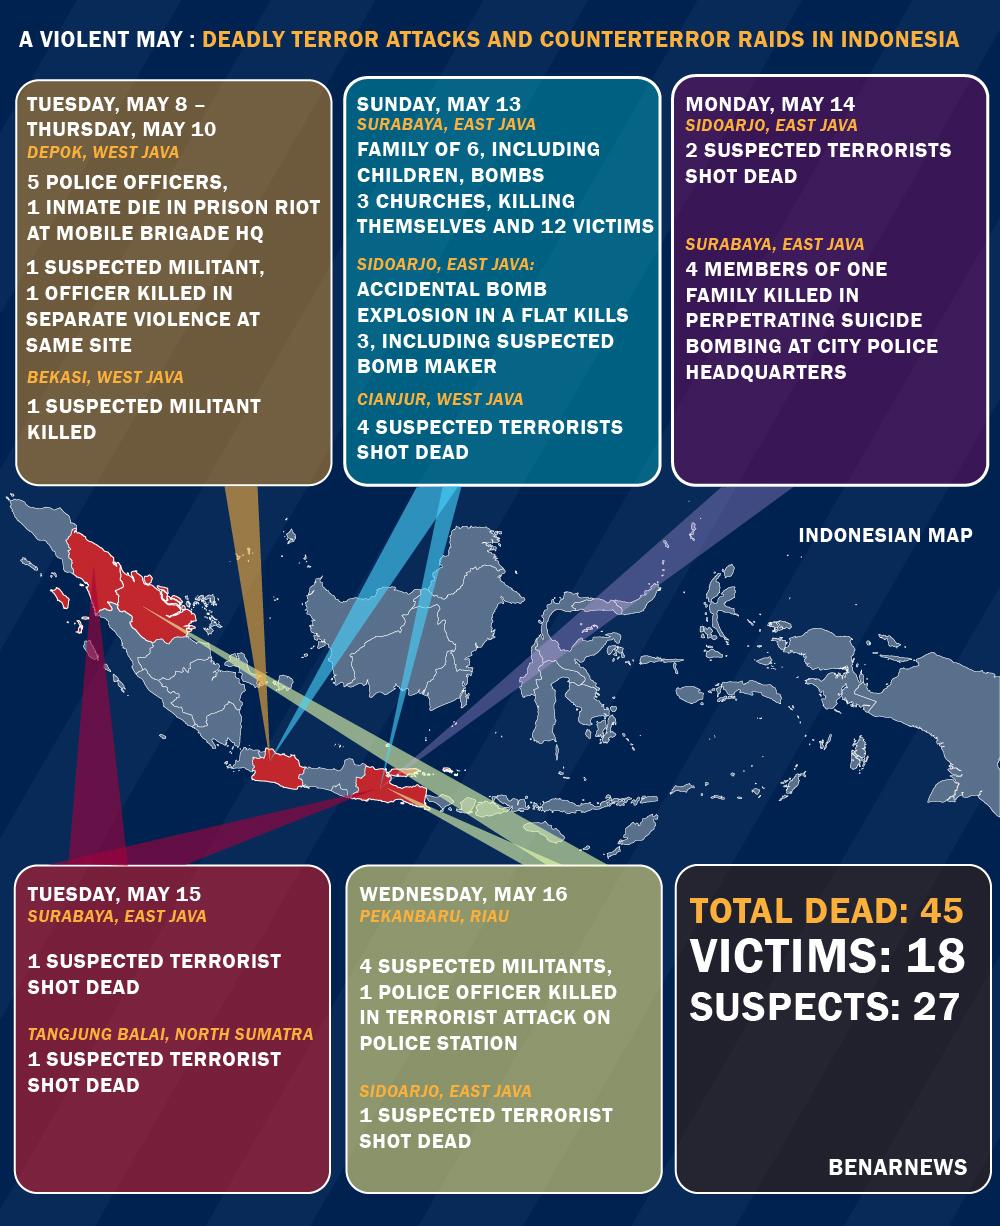 Pemetaan jumlah pelaku dan korban tewas dalam serangan teror dalam rentang beberapa hari sebelum dimulainya Bulan Ramadan, 2018. (BeritaBenar)